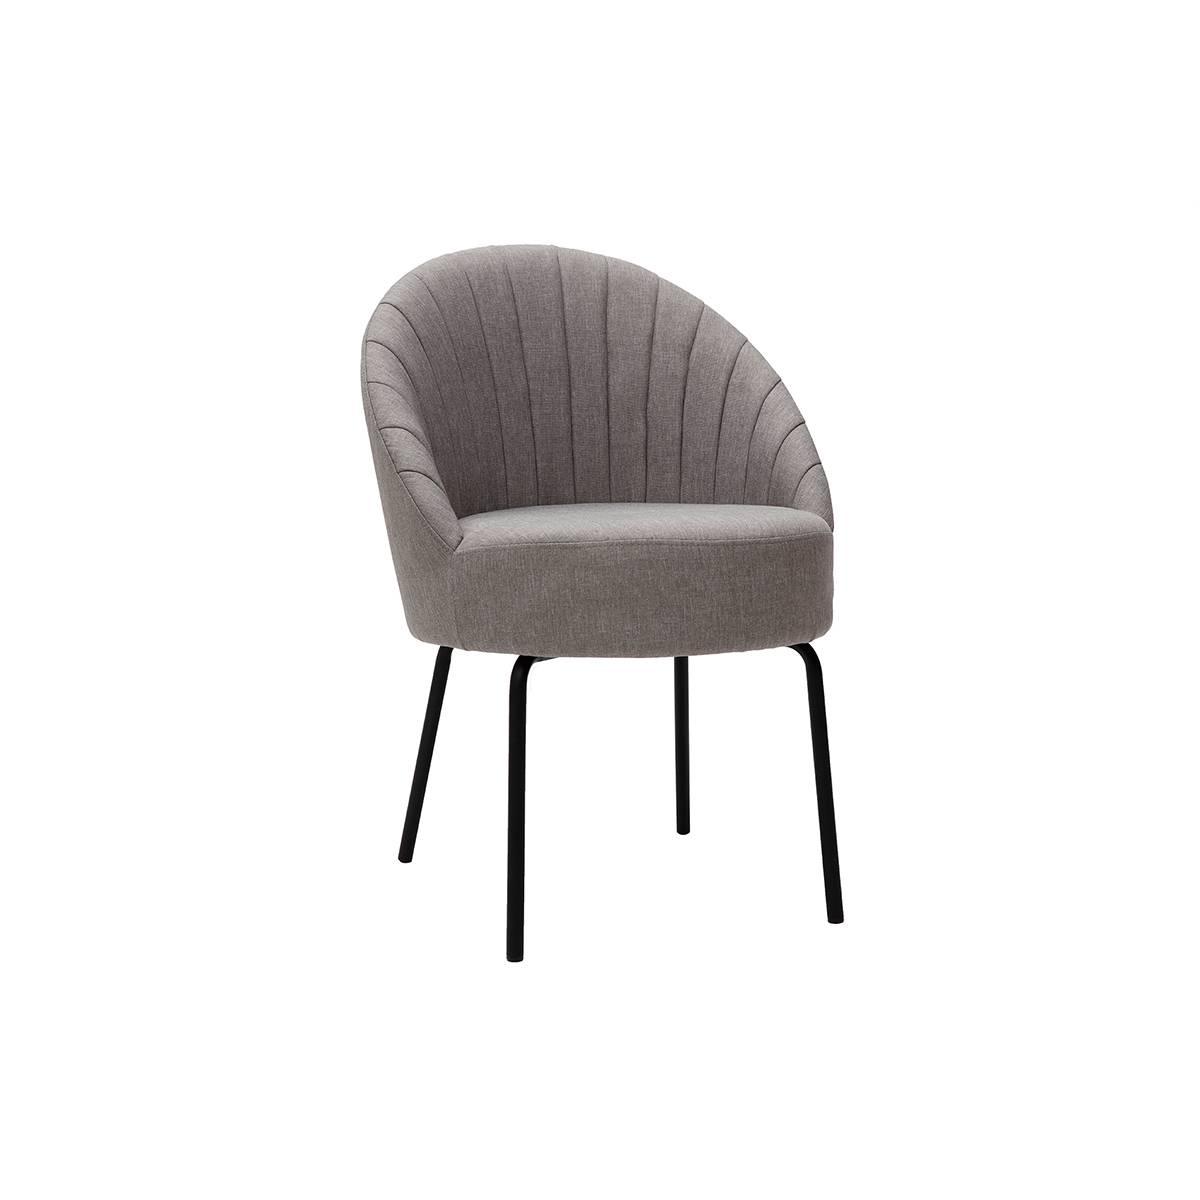 Miliboo Chaise design tissu gris et métal noir IZAAC - Miliboo & Stéphane Plaza